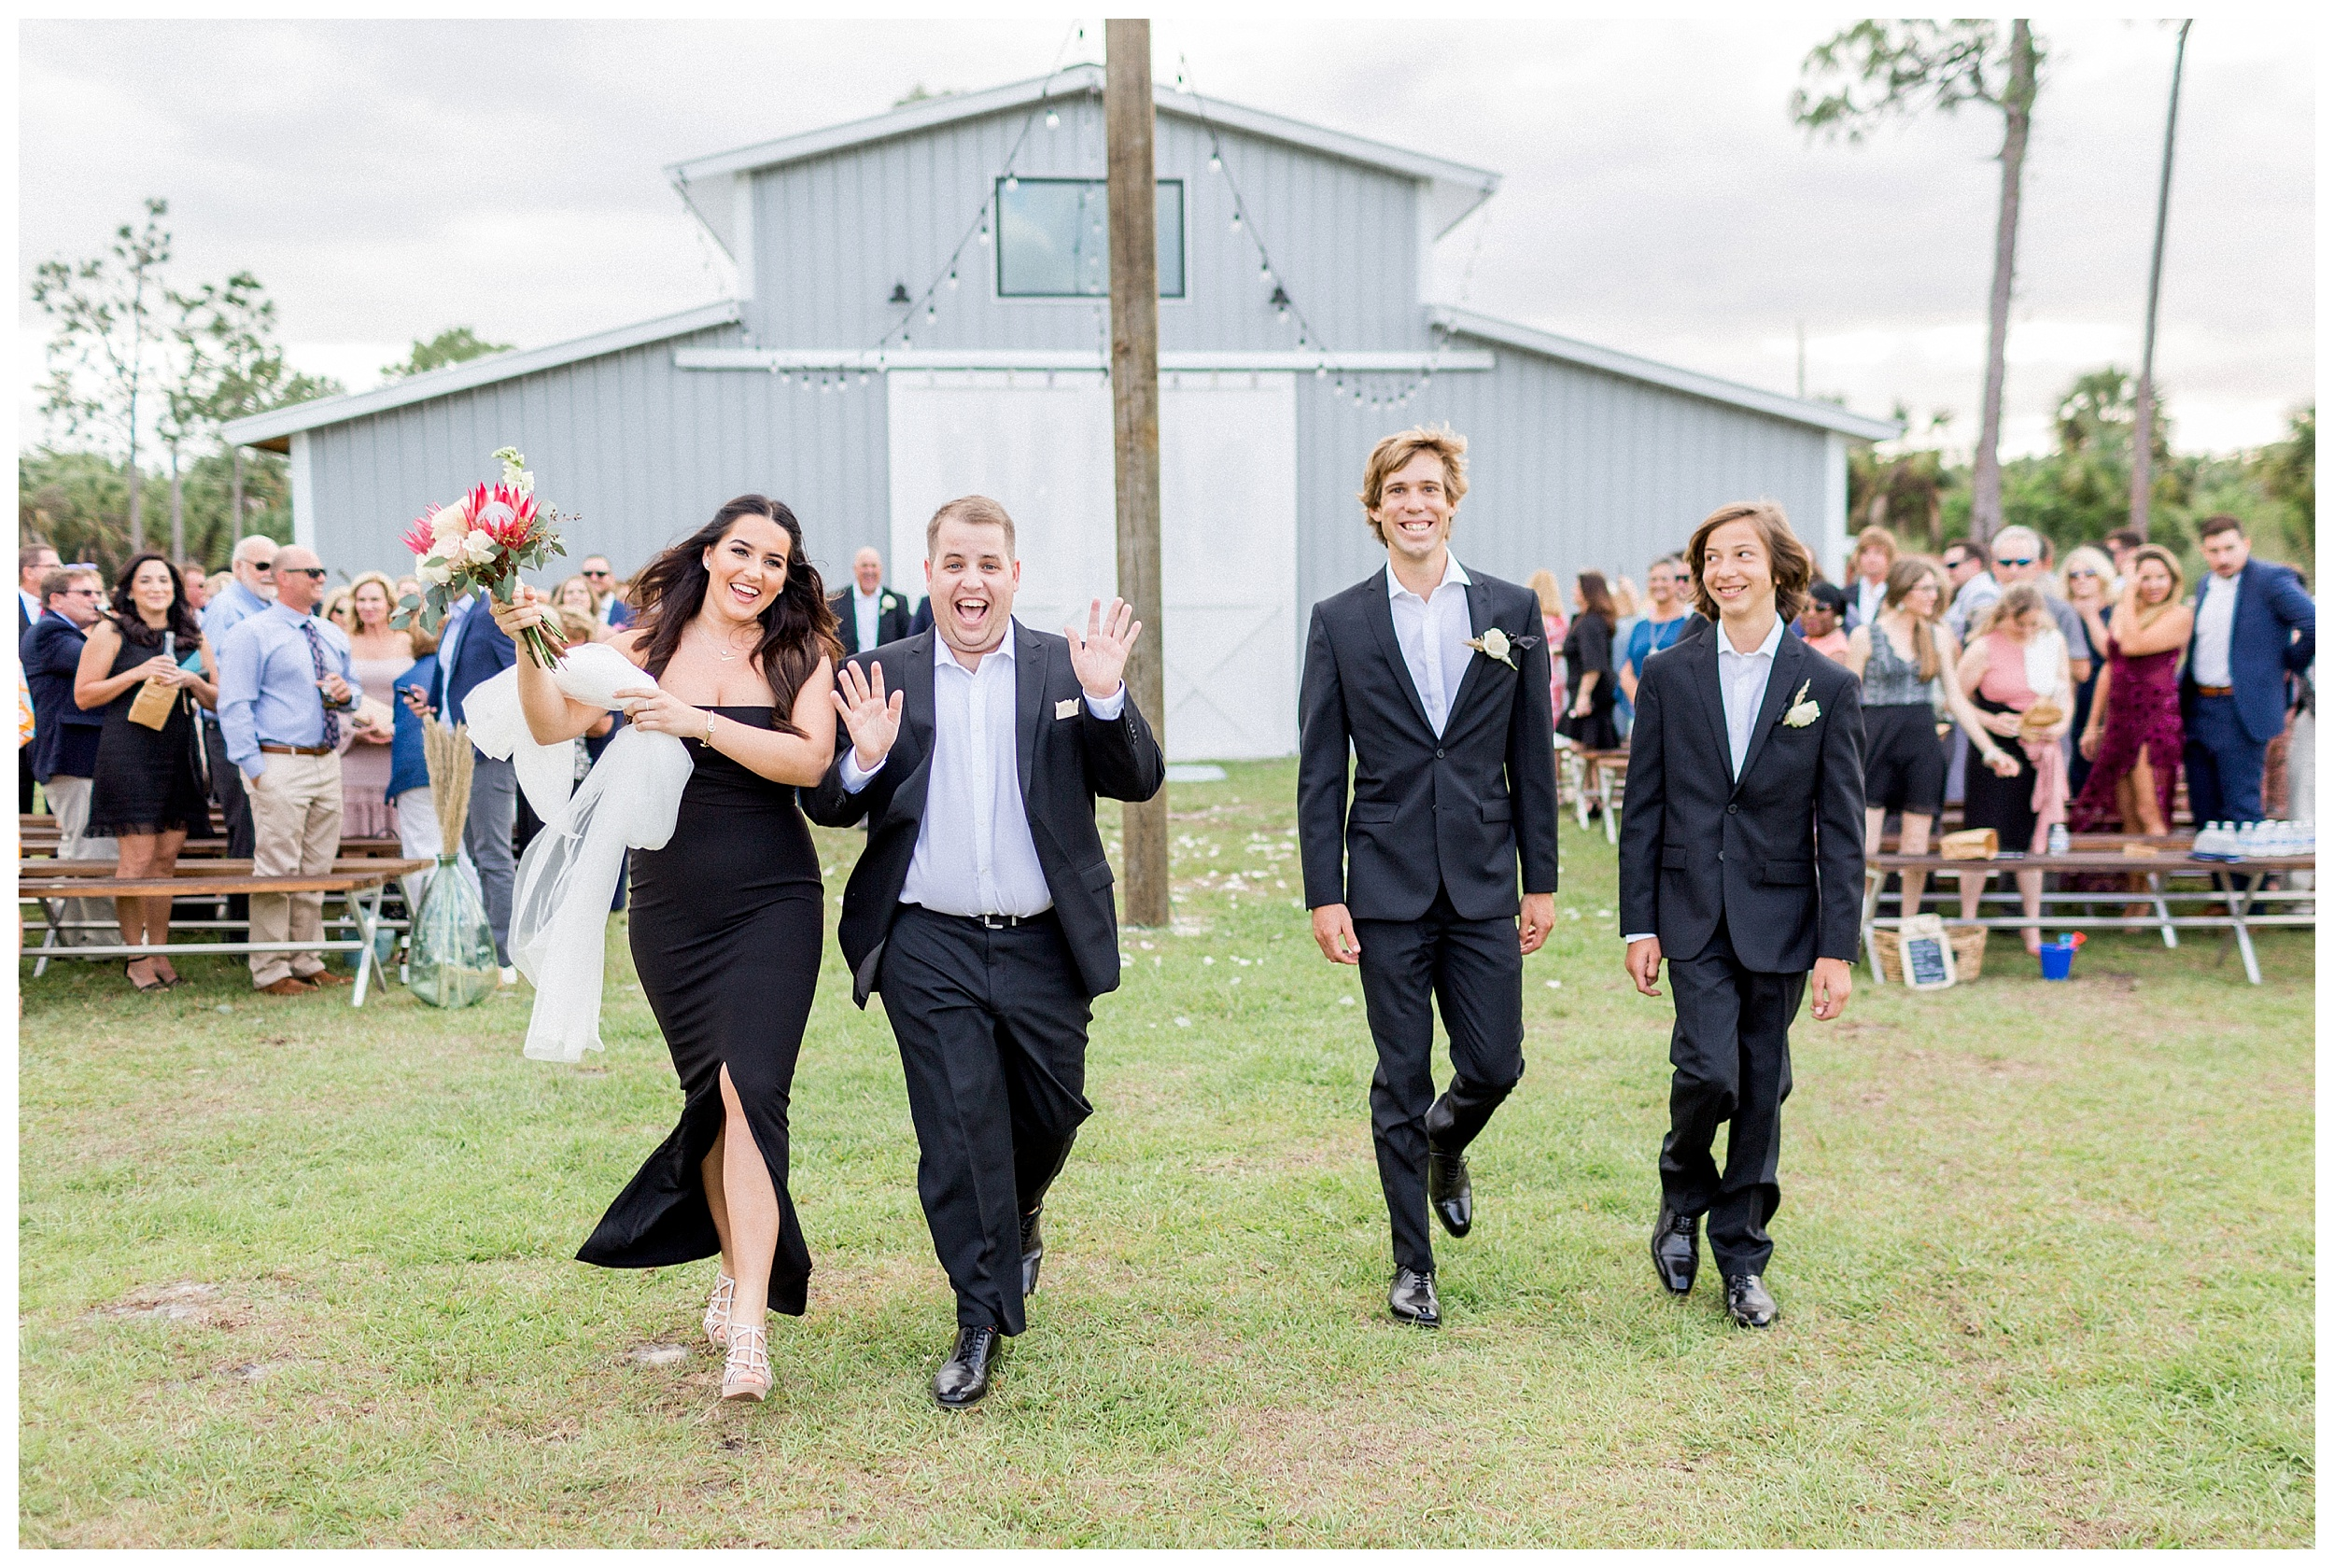 South Florida Wedding Photographer Kir Tuben_0084.jpg